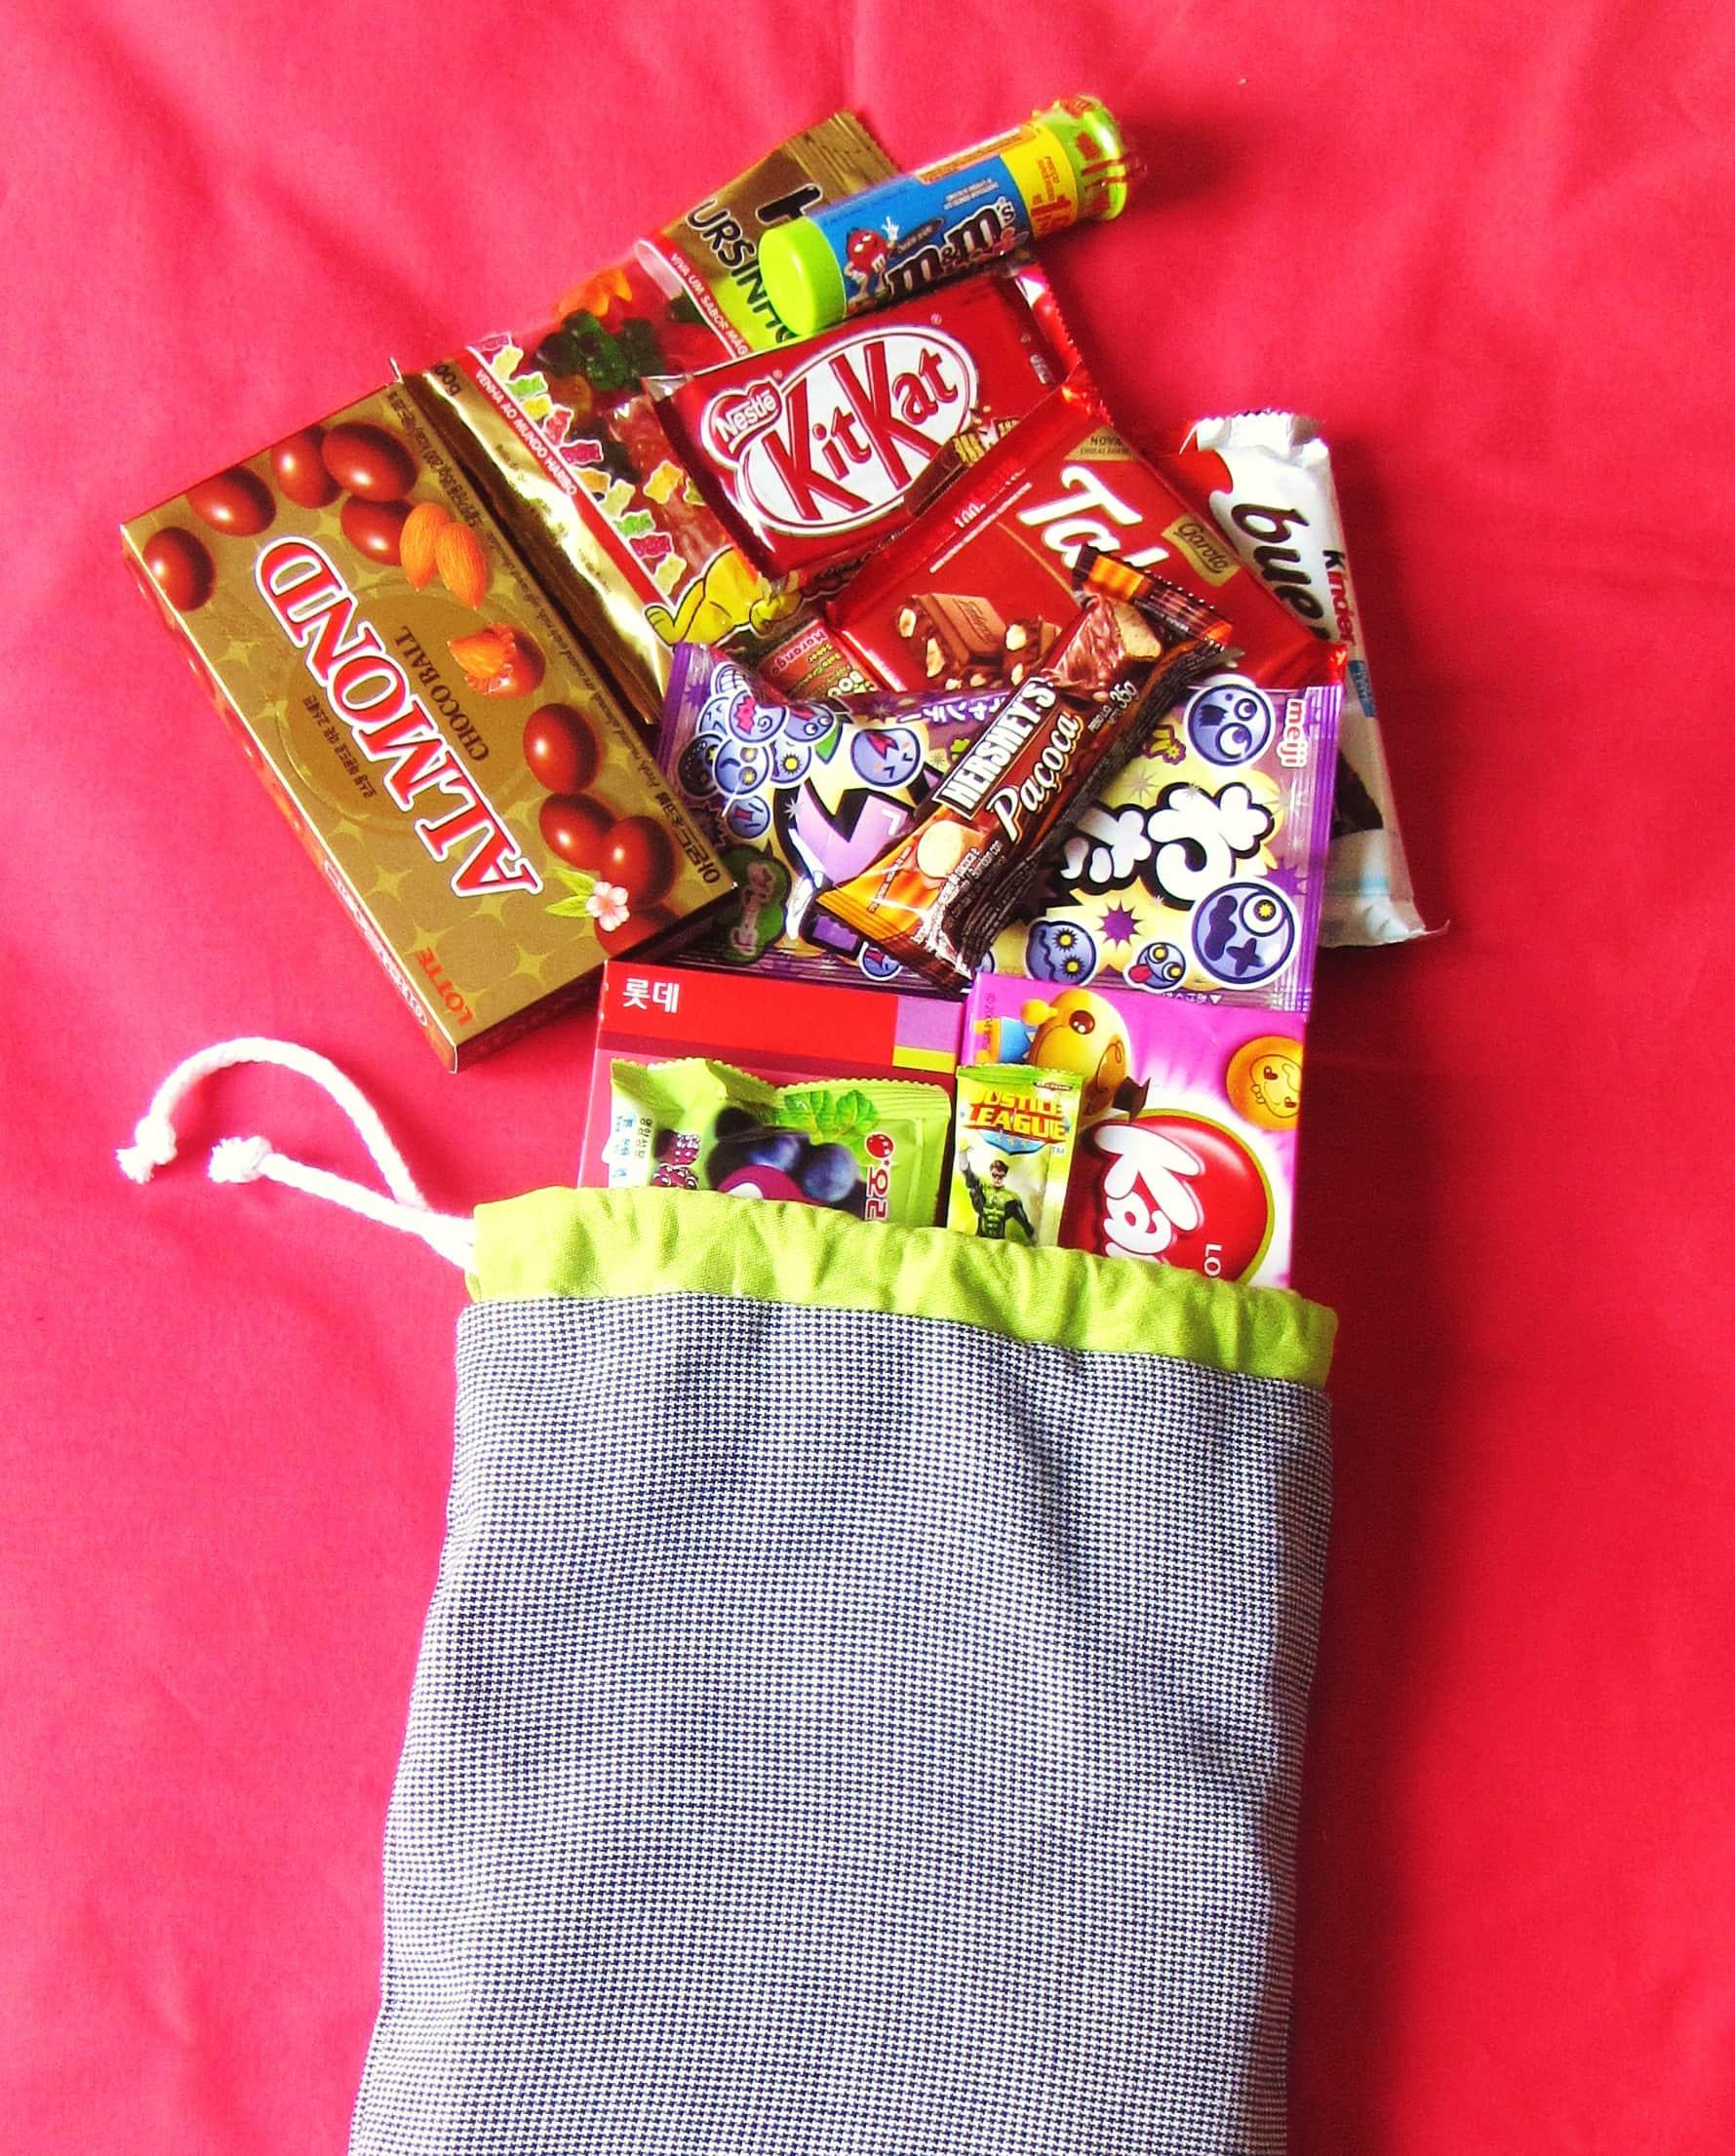 pascoa-chocolate-2